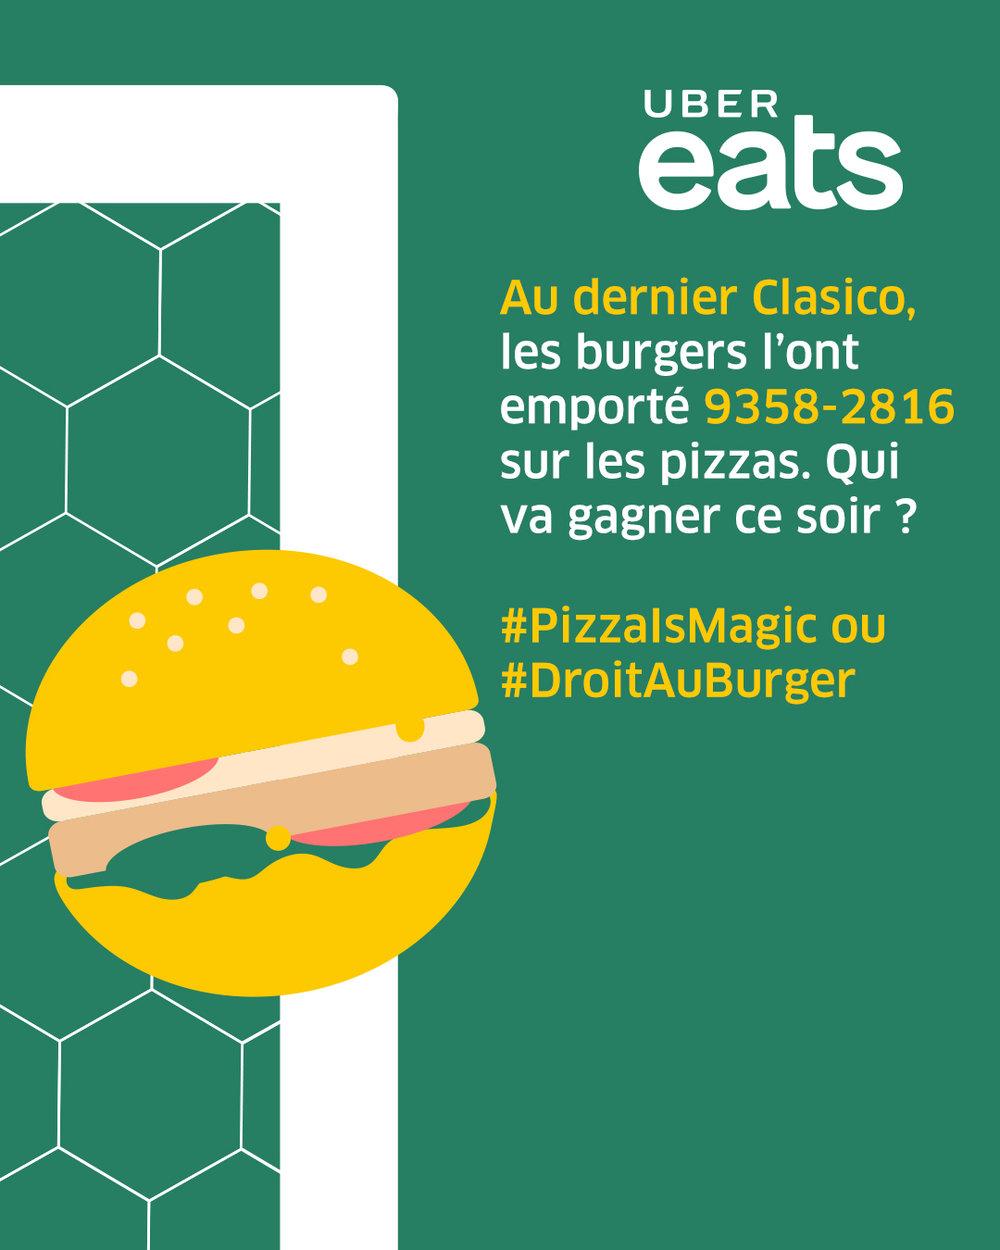 UBEREATS-1080x1350-burger-FR.jpg